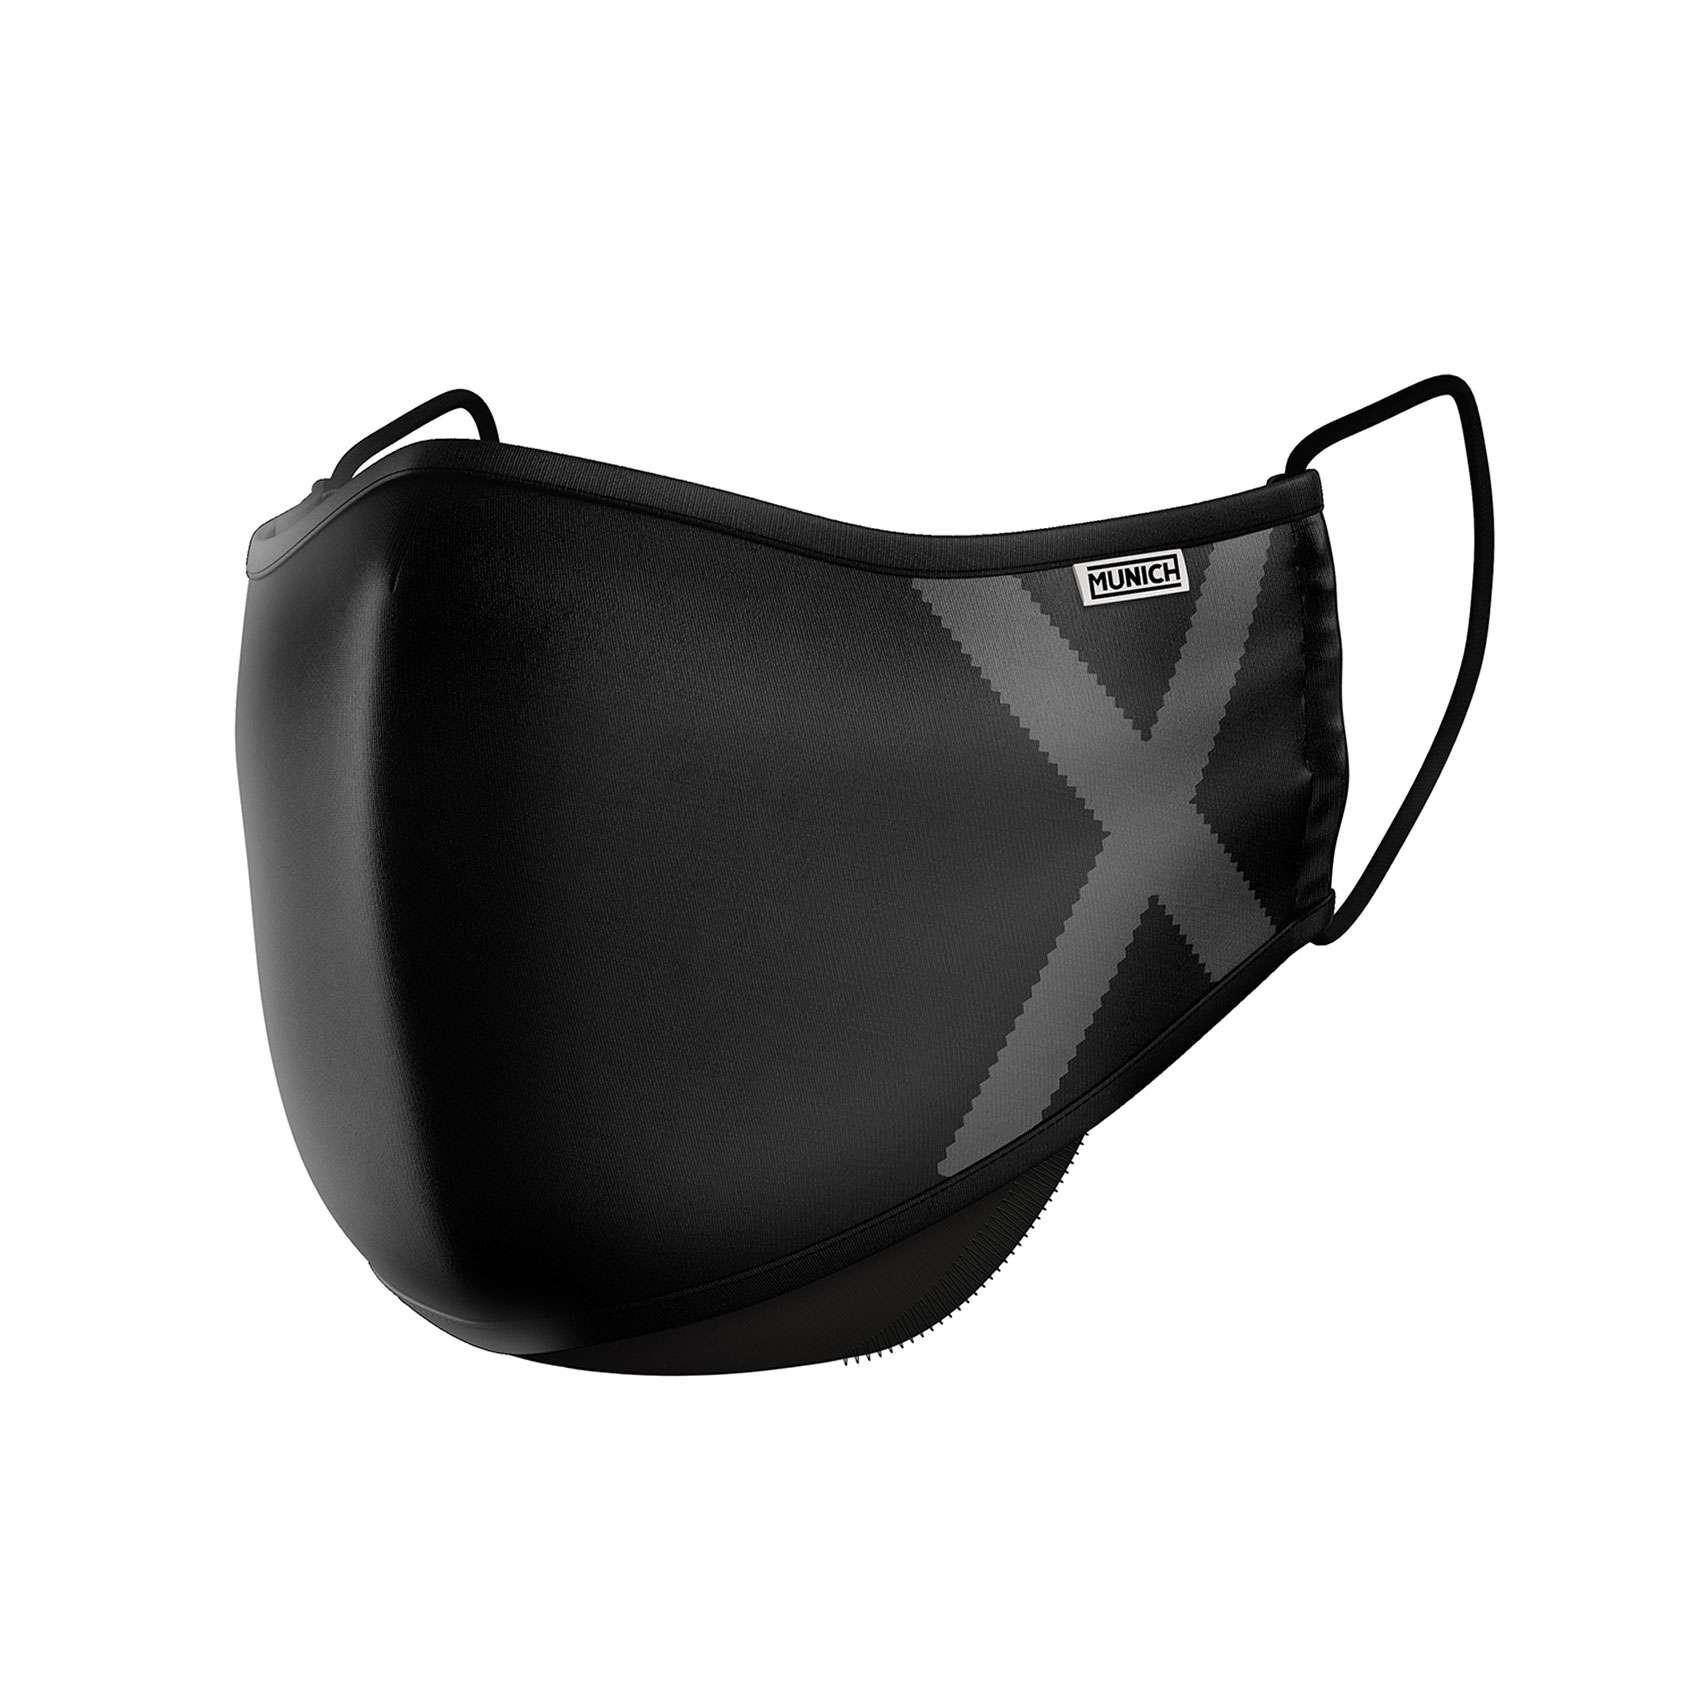 MASCHERA X-SHIELD V2.5 BLACK